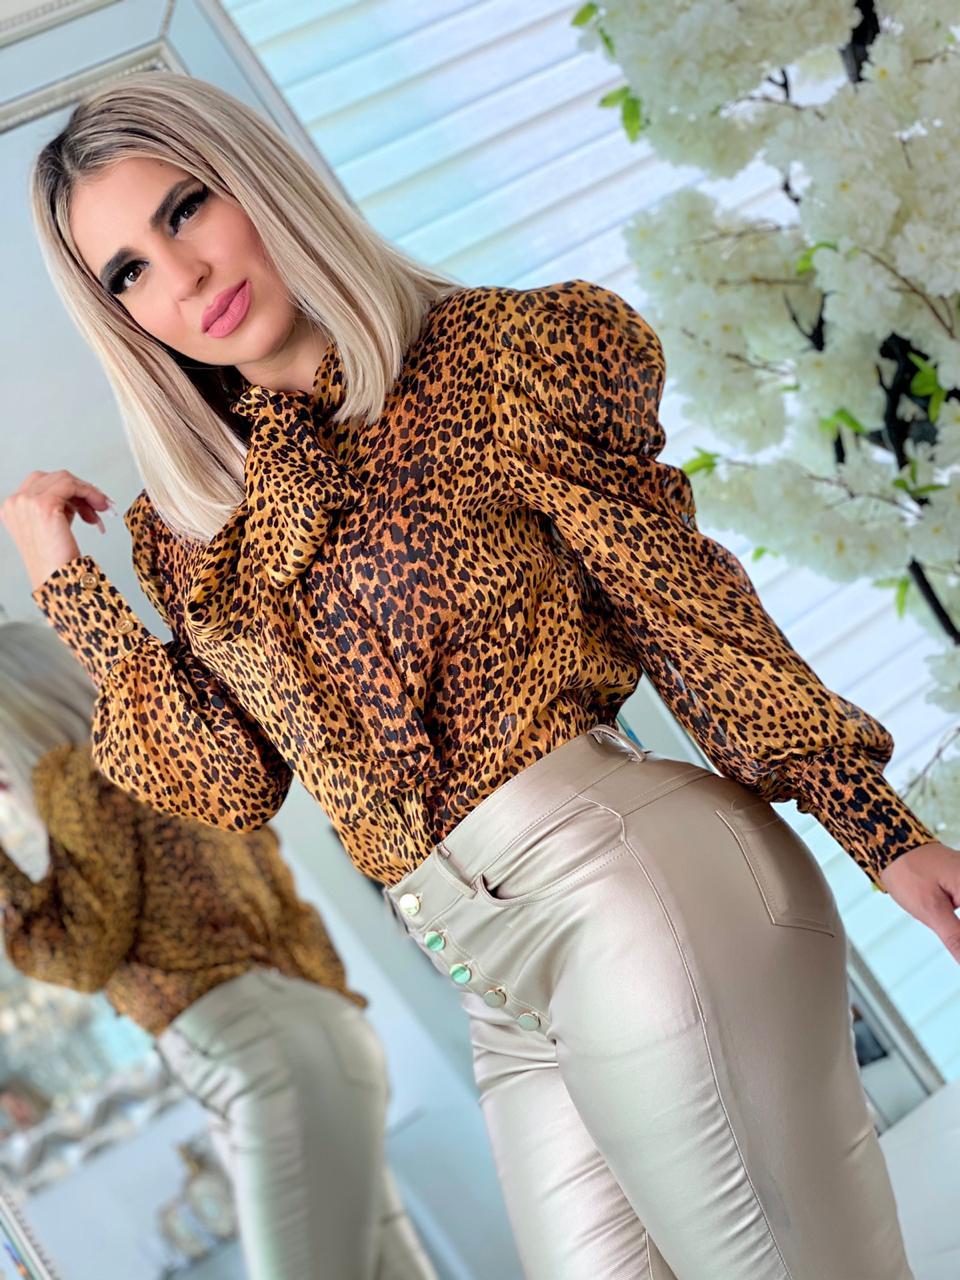 Image of Blouse(Blusa) Animal Print